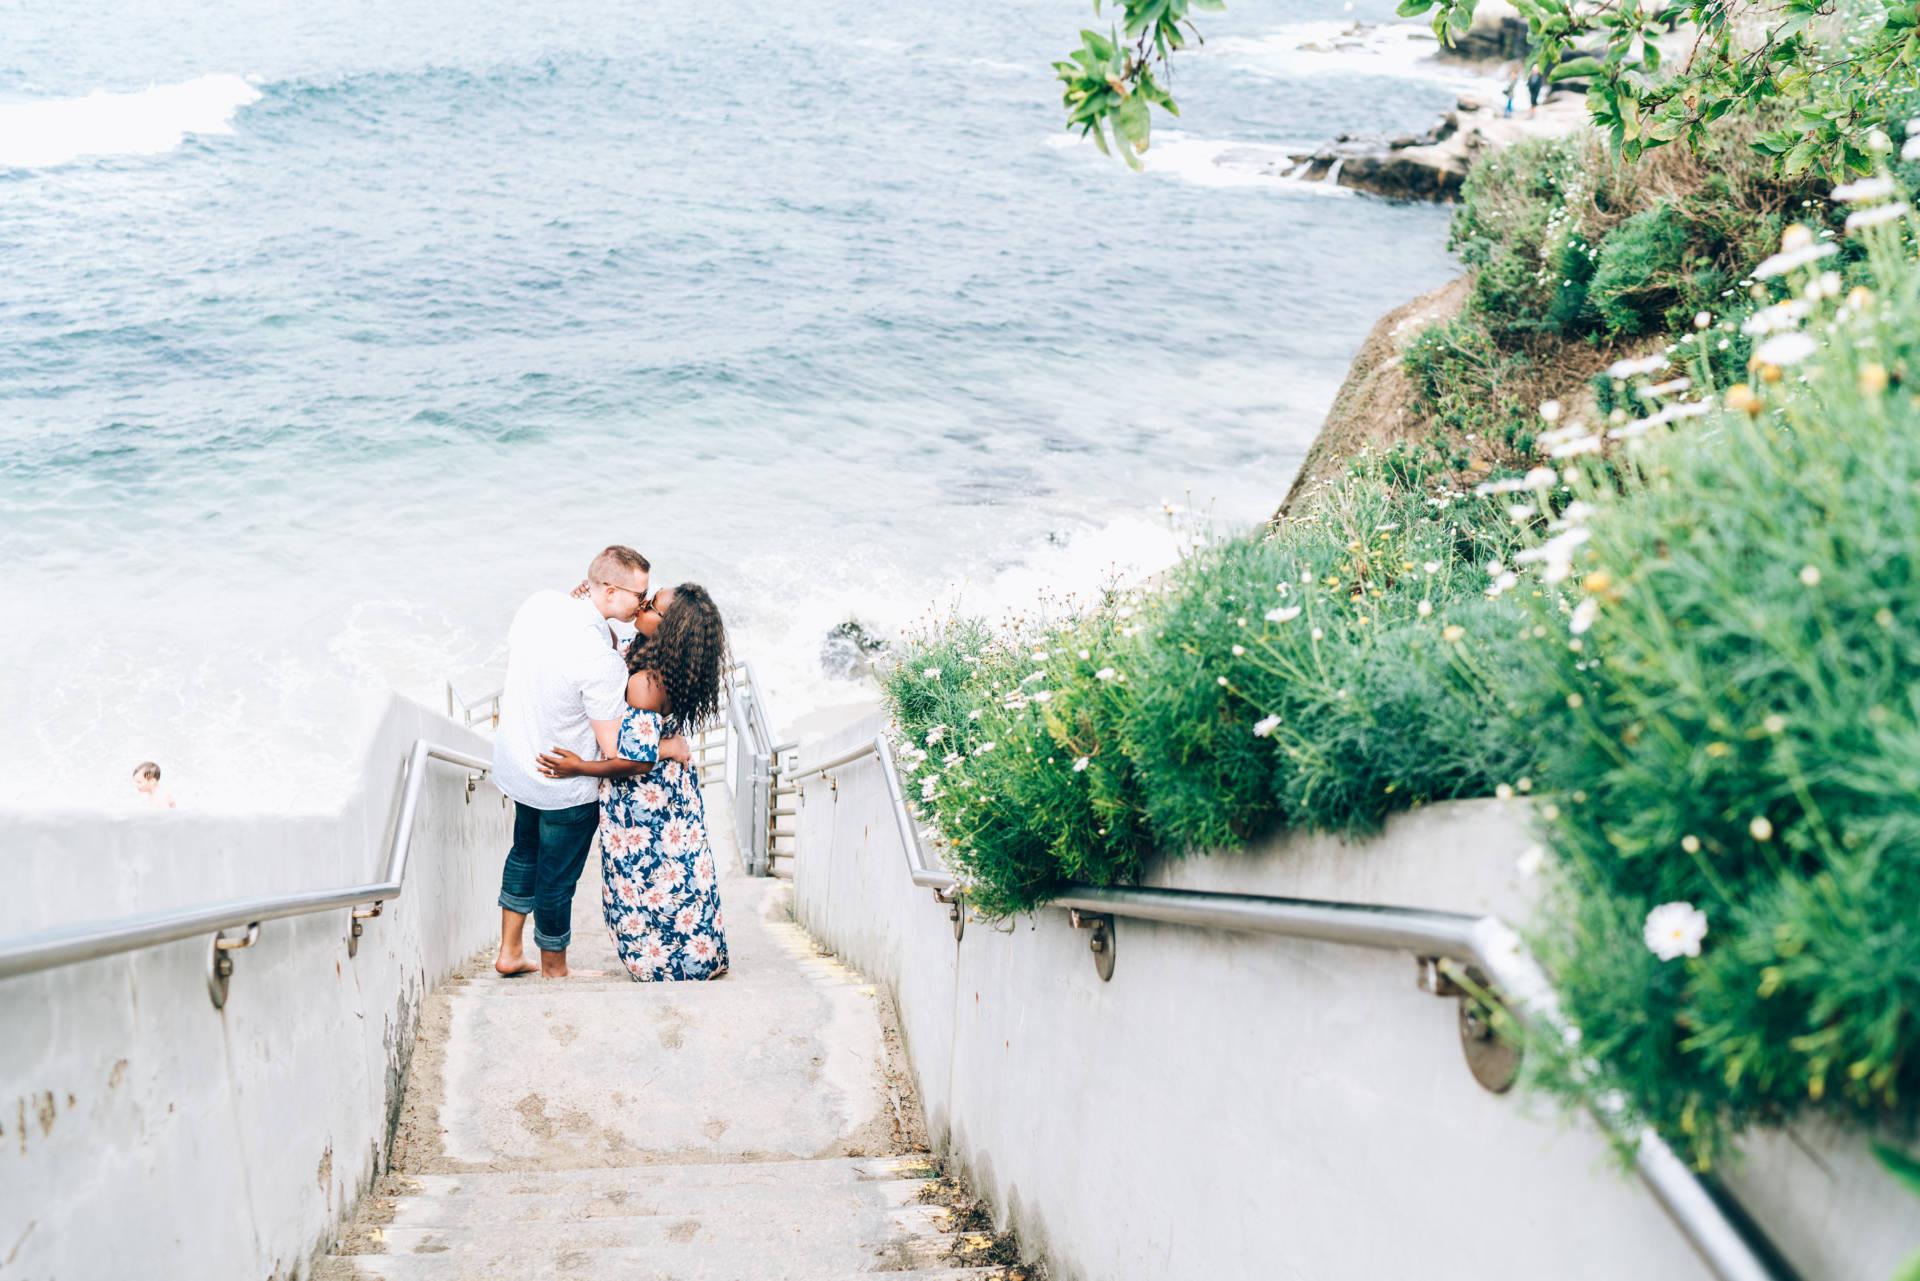 Ruthie Ridley Blog La Jolla Travel Guide